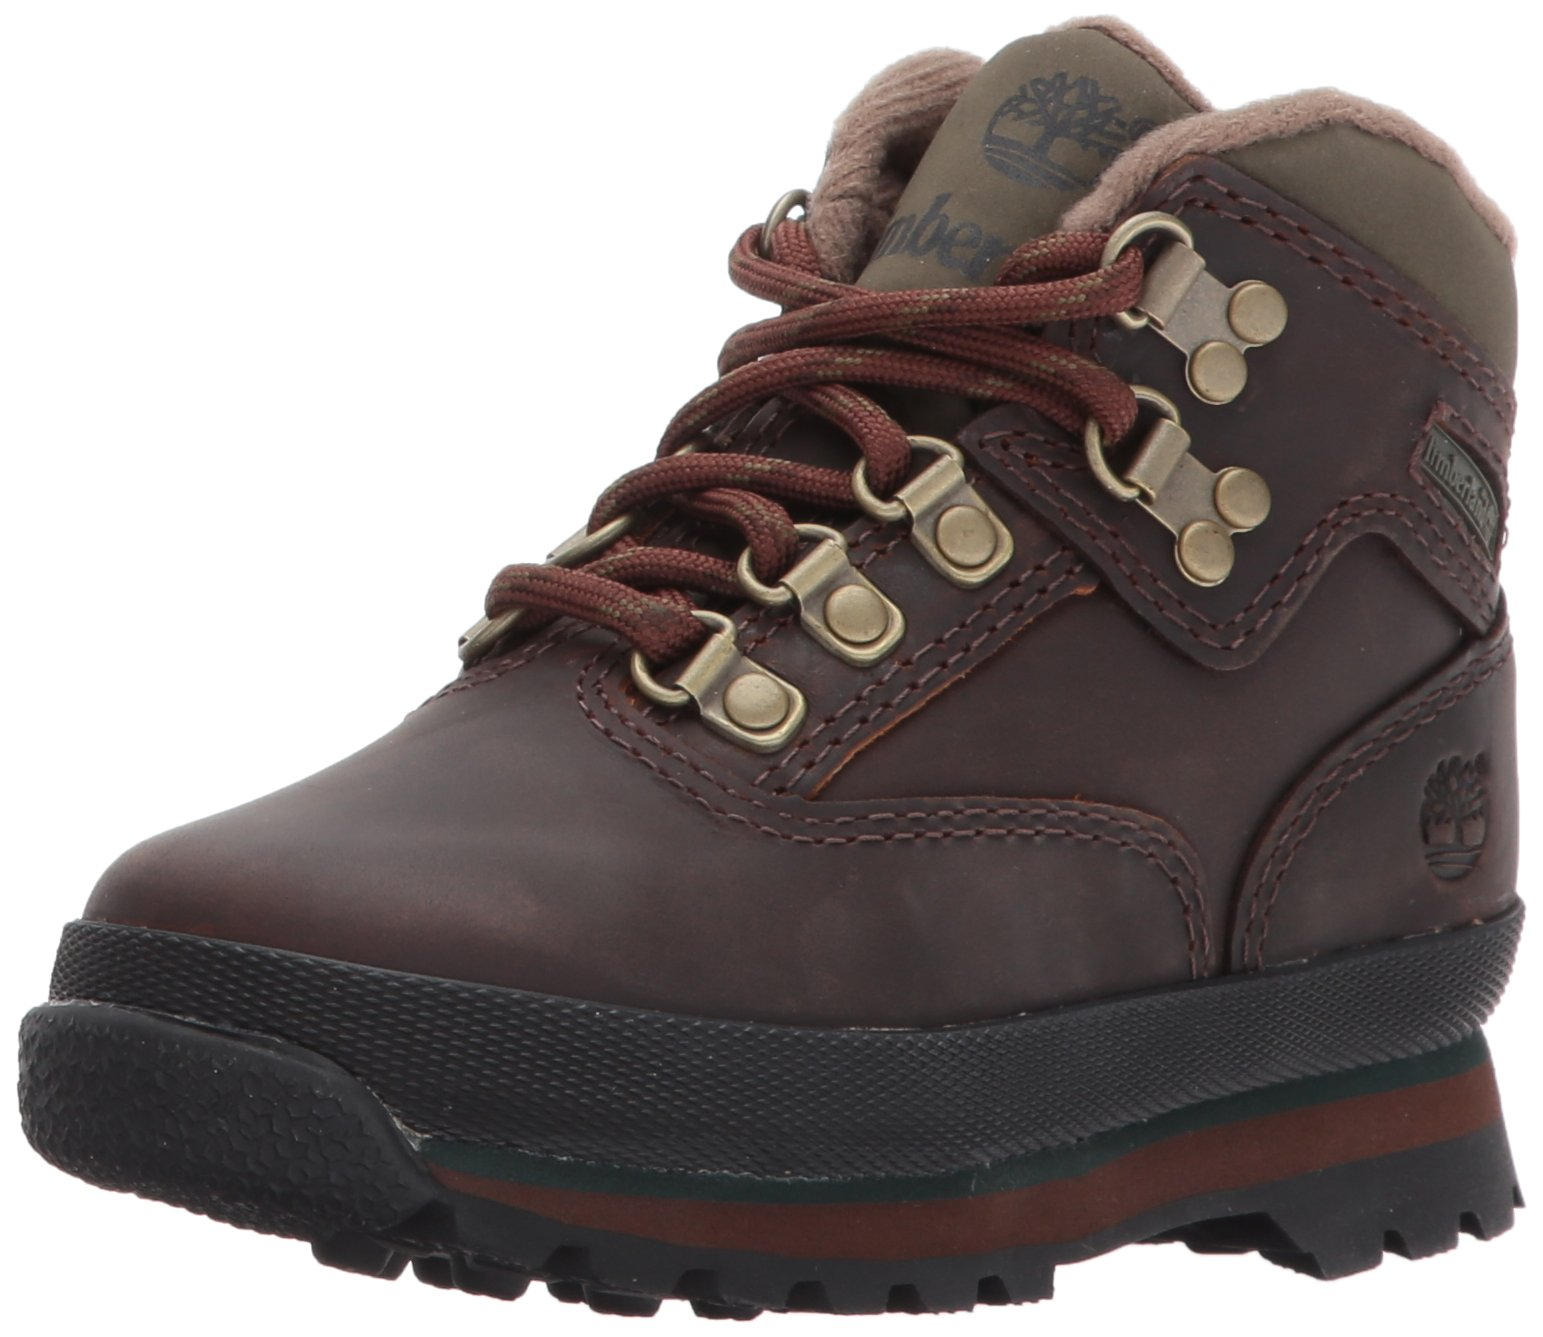 Timberland Euro Hiker Boot (Toddler/Little Kid/Big Kid),Brown,5.5 M US Big Kid